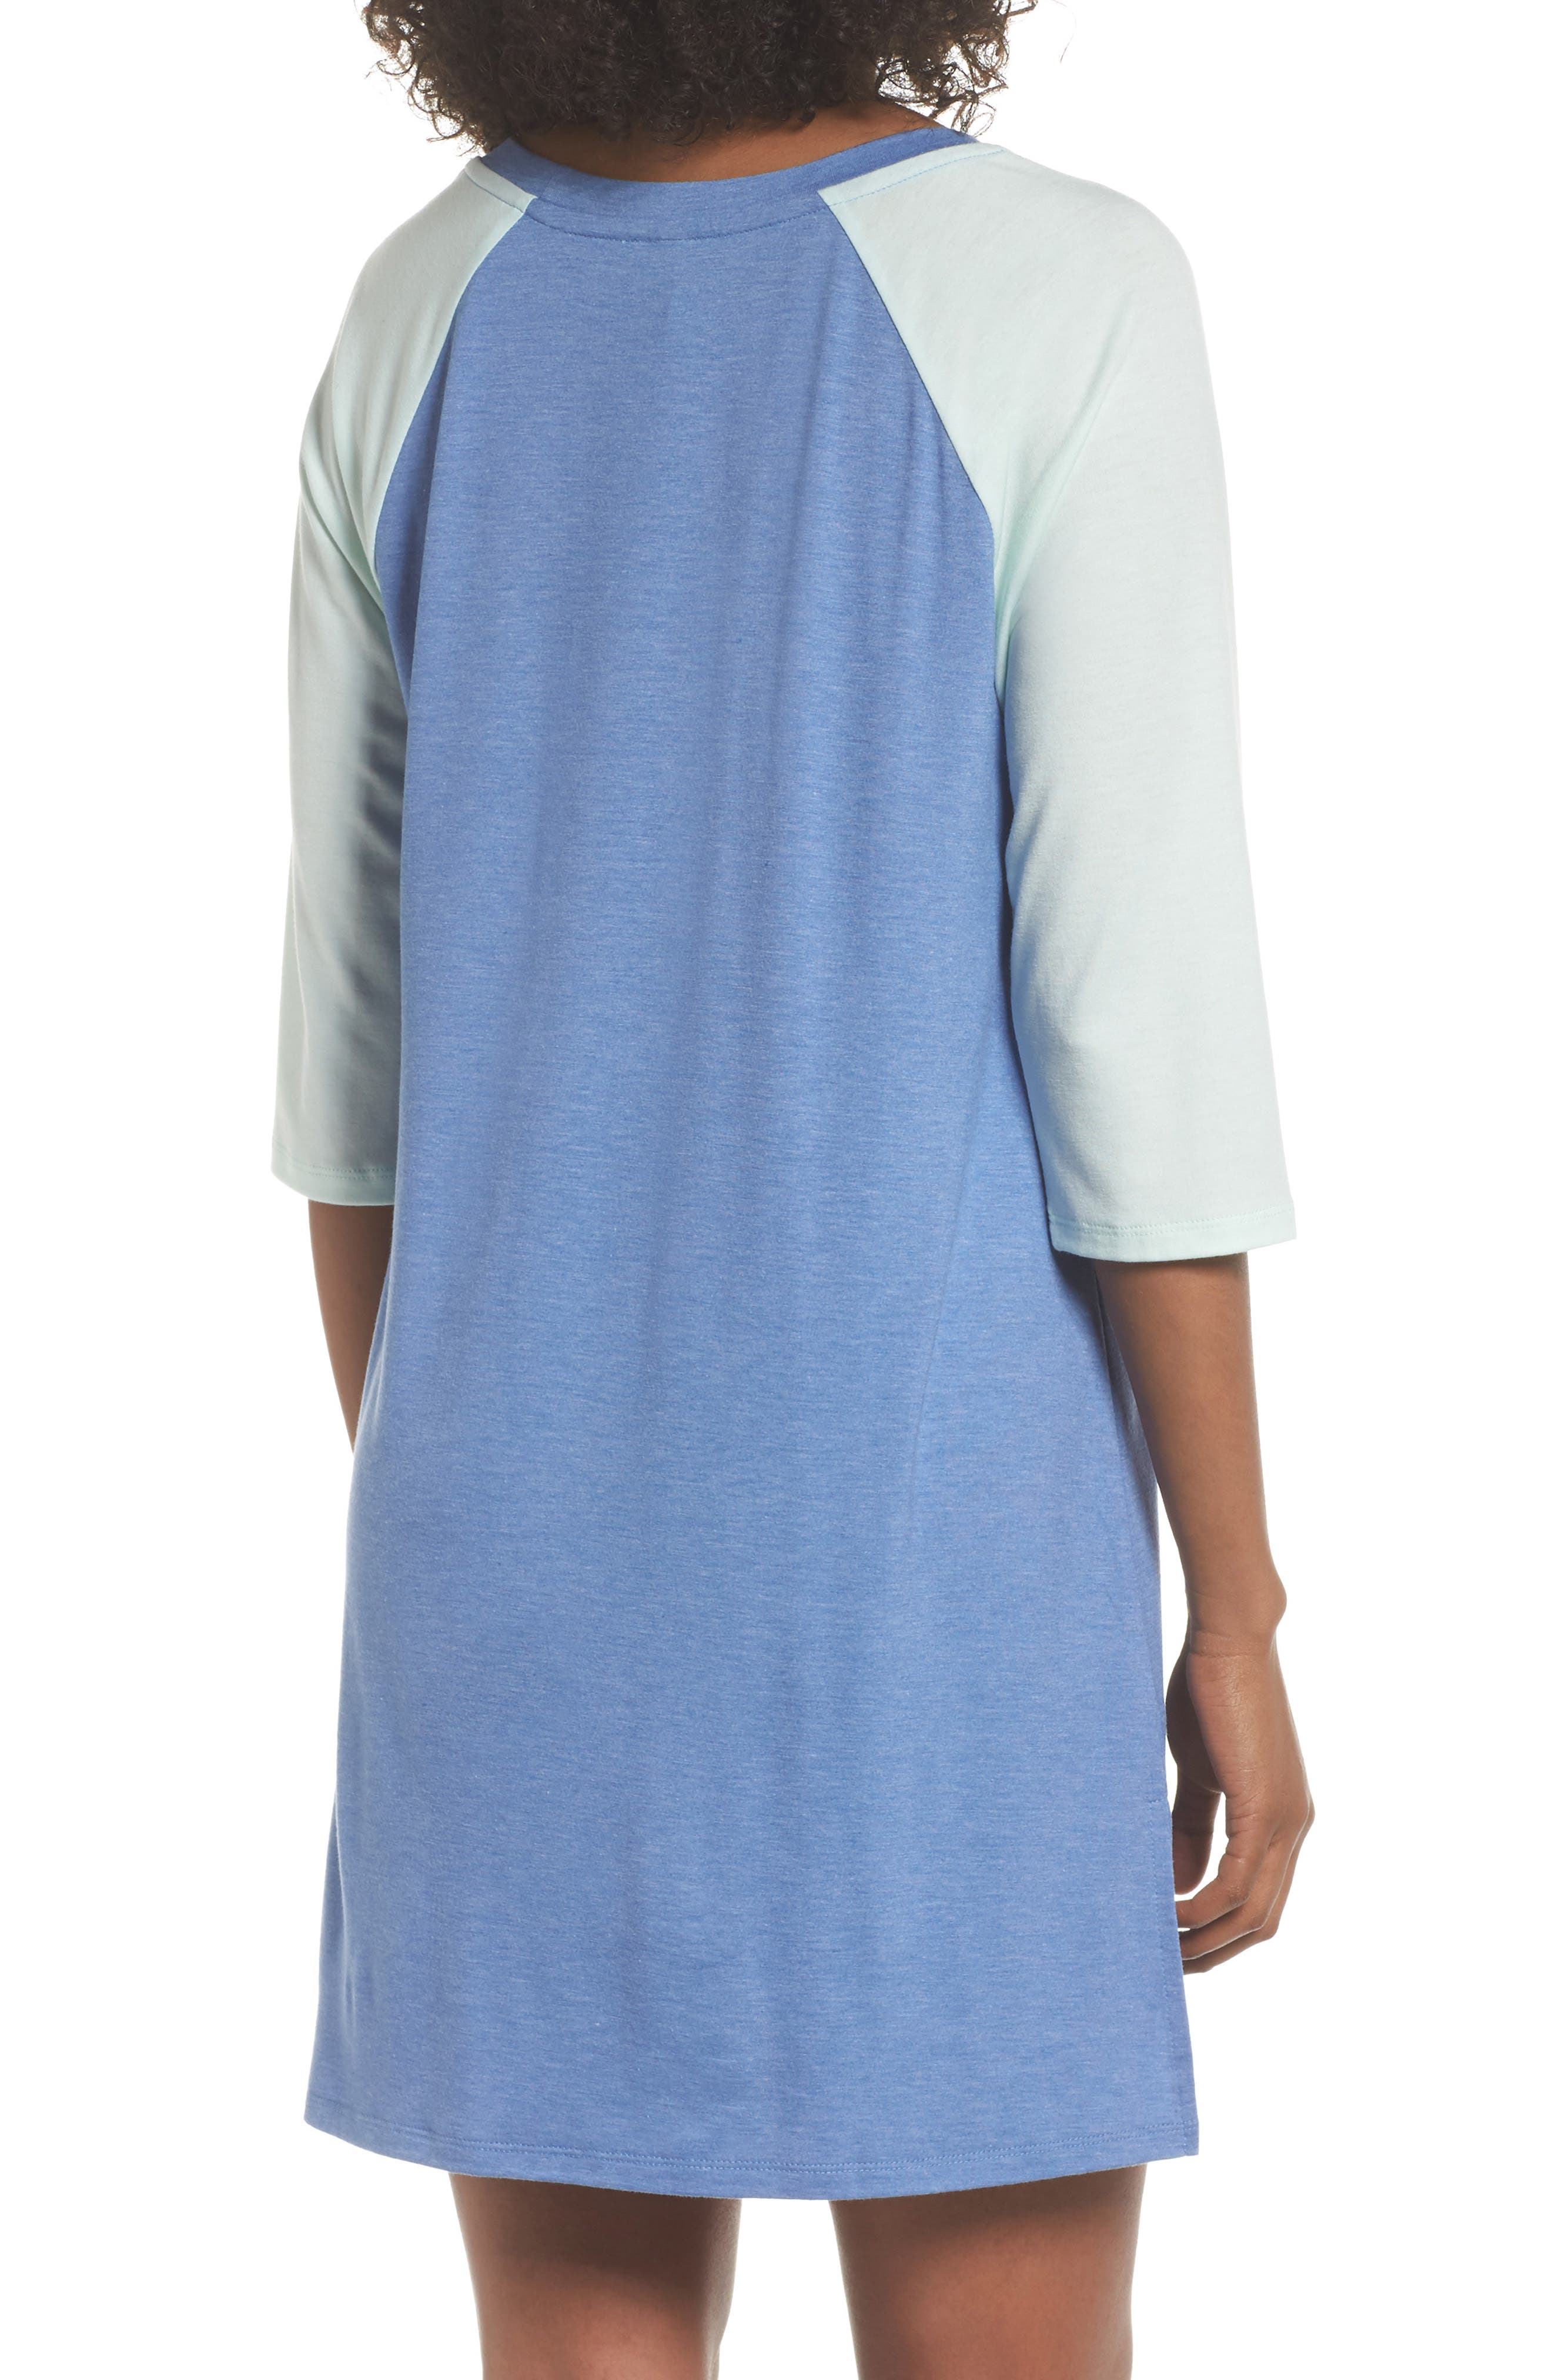 Alternate Image 2  - Honeydew All American Sleep Shirt (2 for $60)